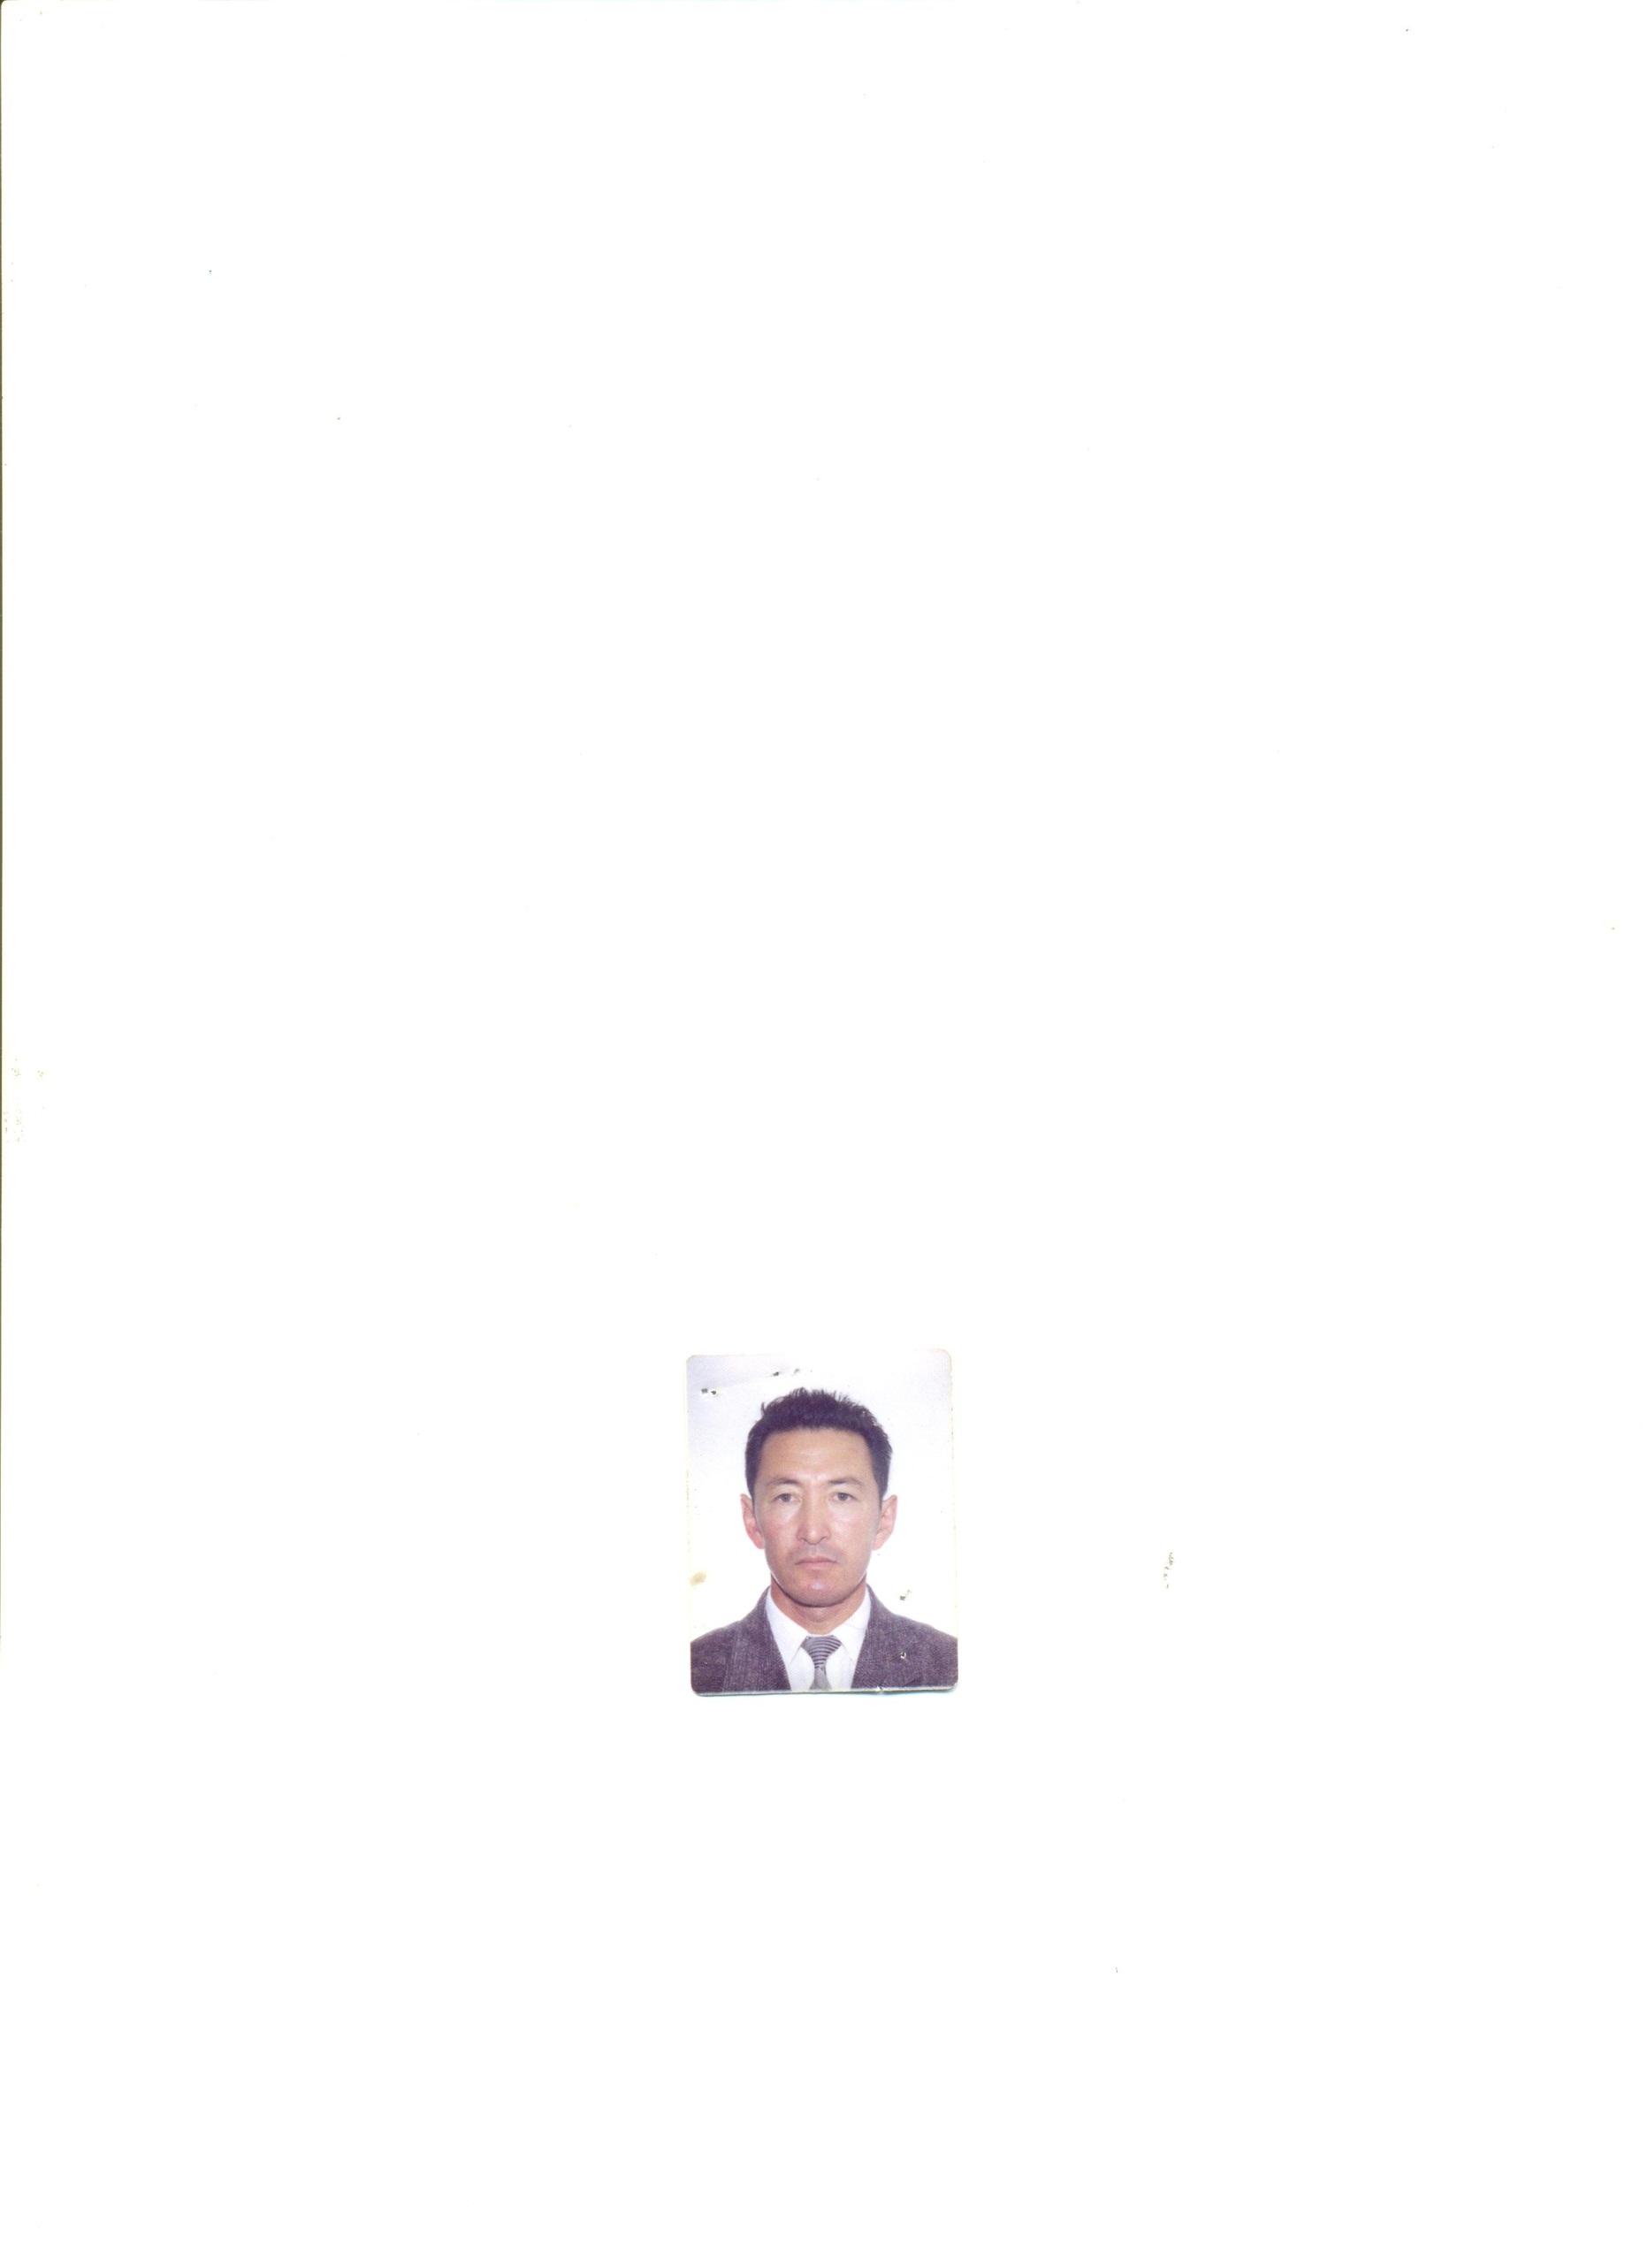 C:\Users\Okushi-6\Pictures\2014-12-25 пролрп\пролрп 001.jpg